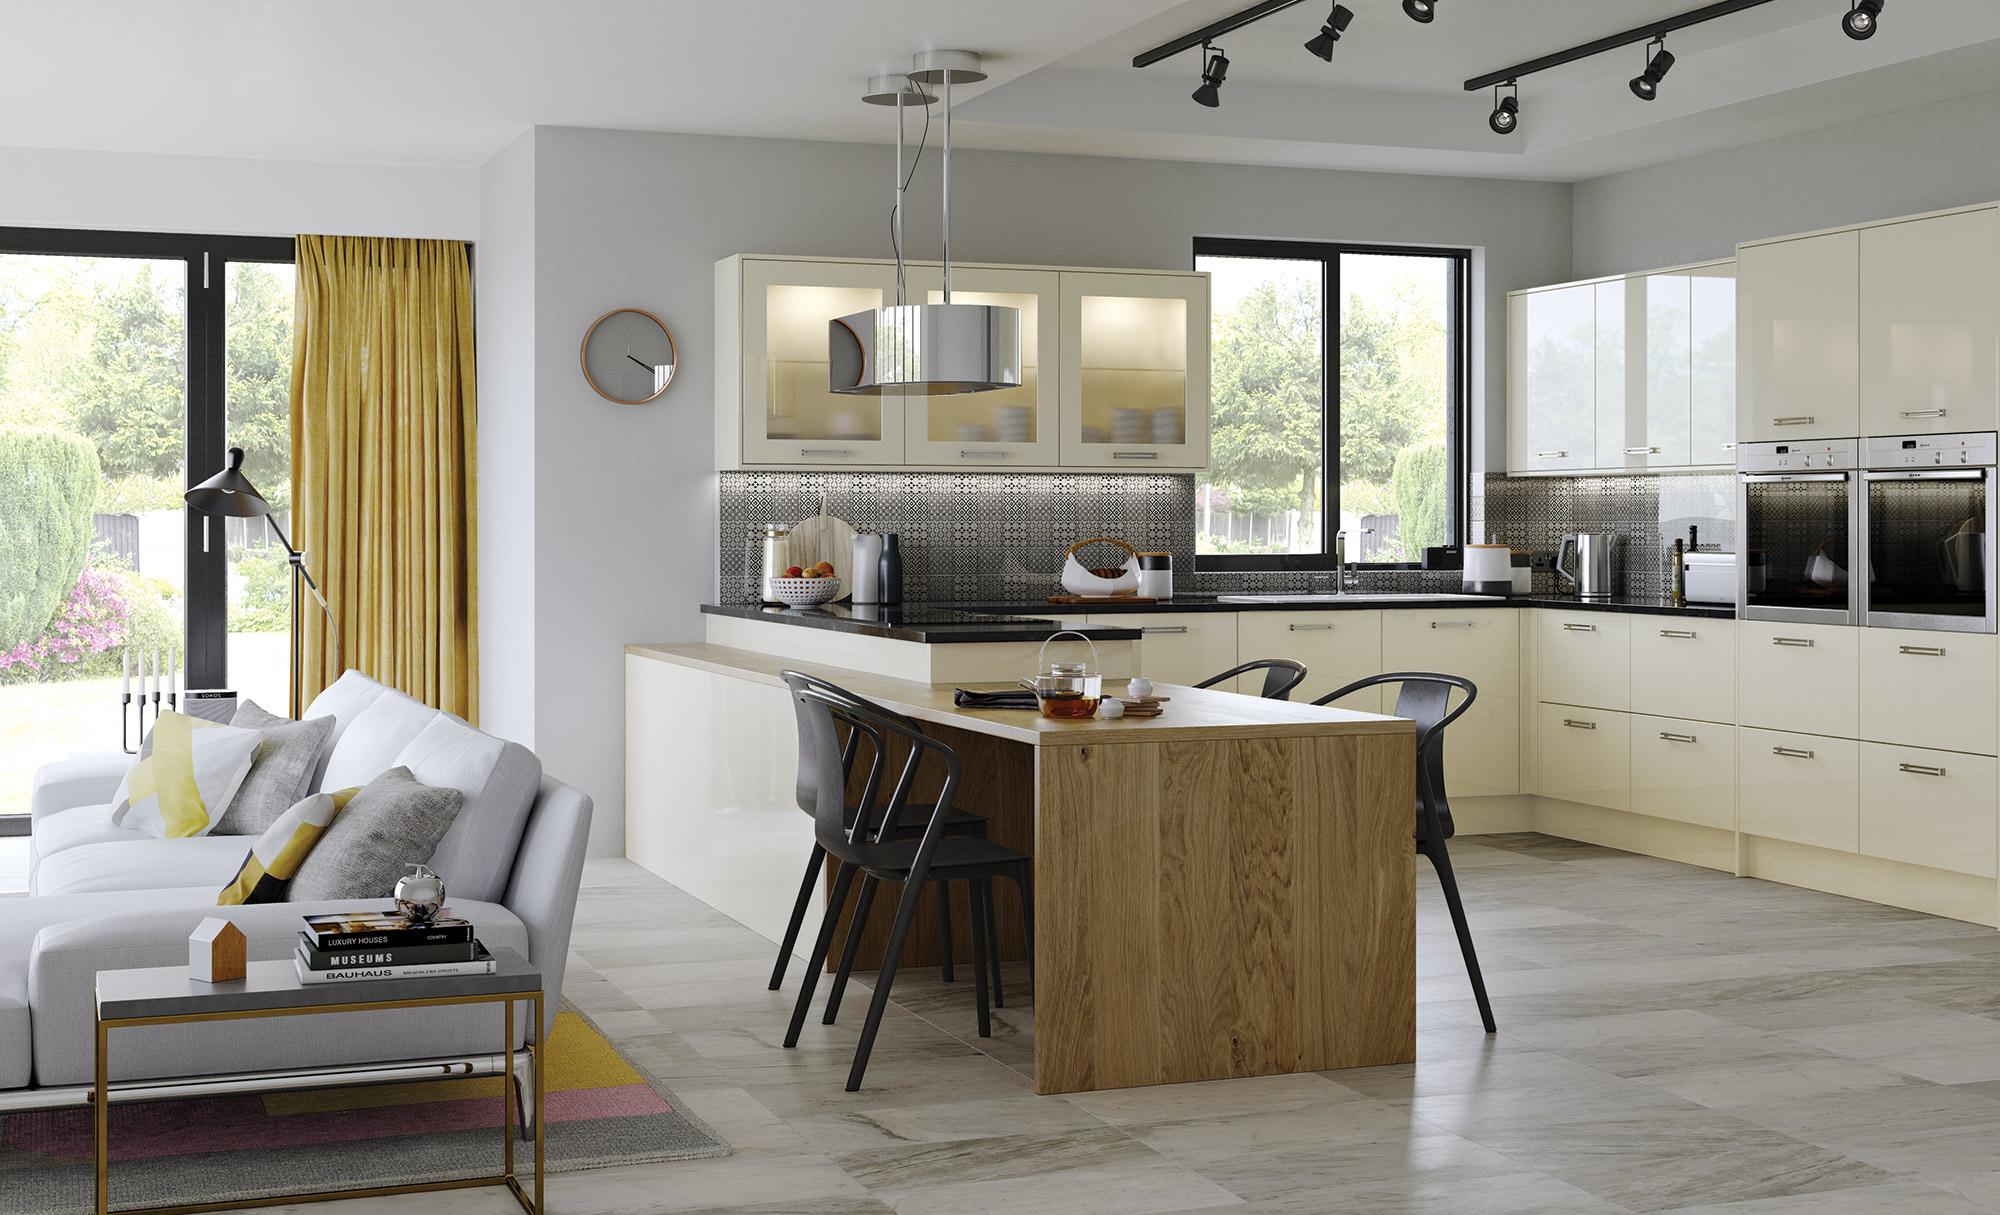 Modern Contemporary Zola Gloss Ivory Kitchen - Kitchen Design - Alan Kelly Kitchens - Waterford